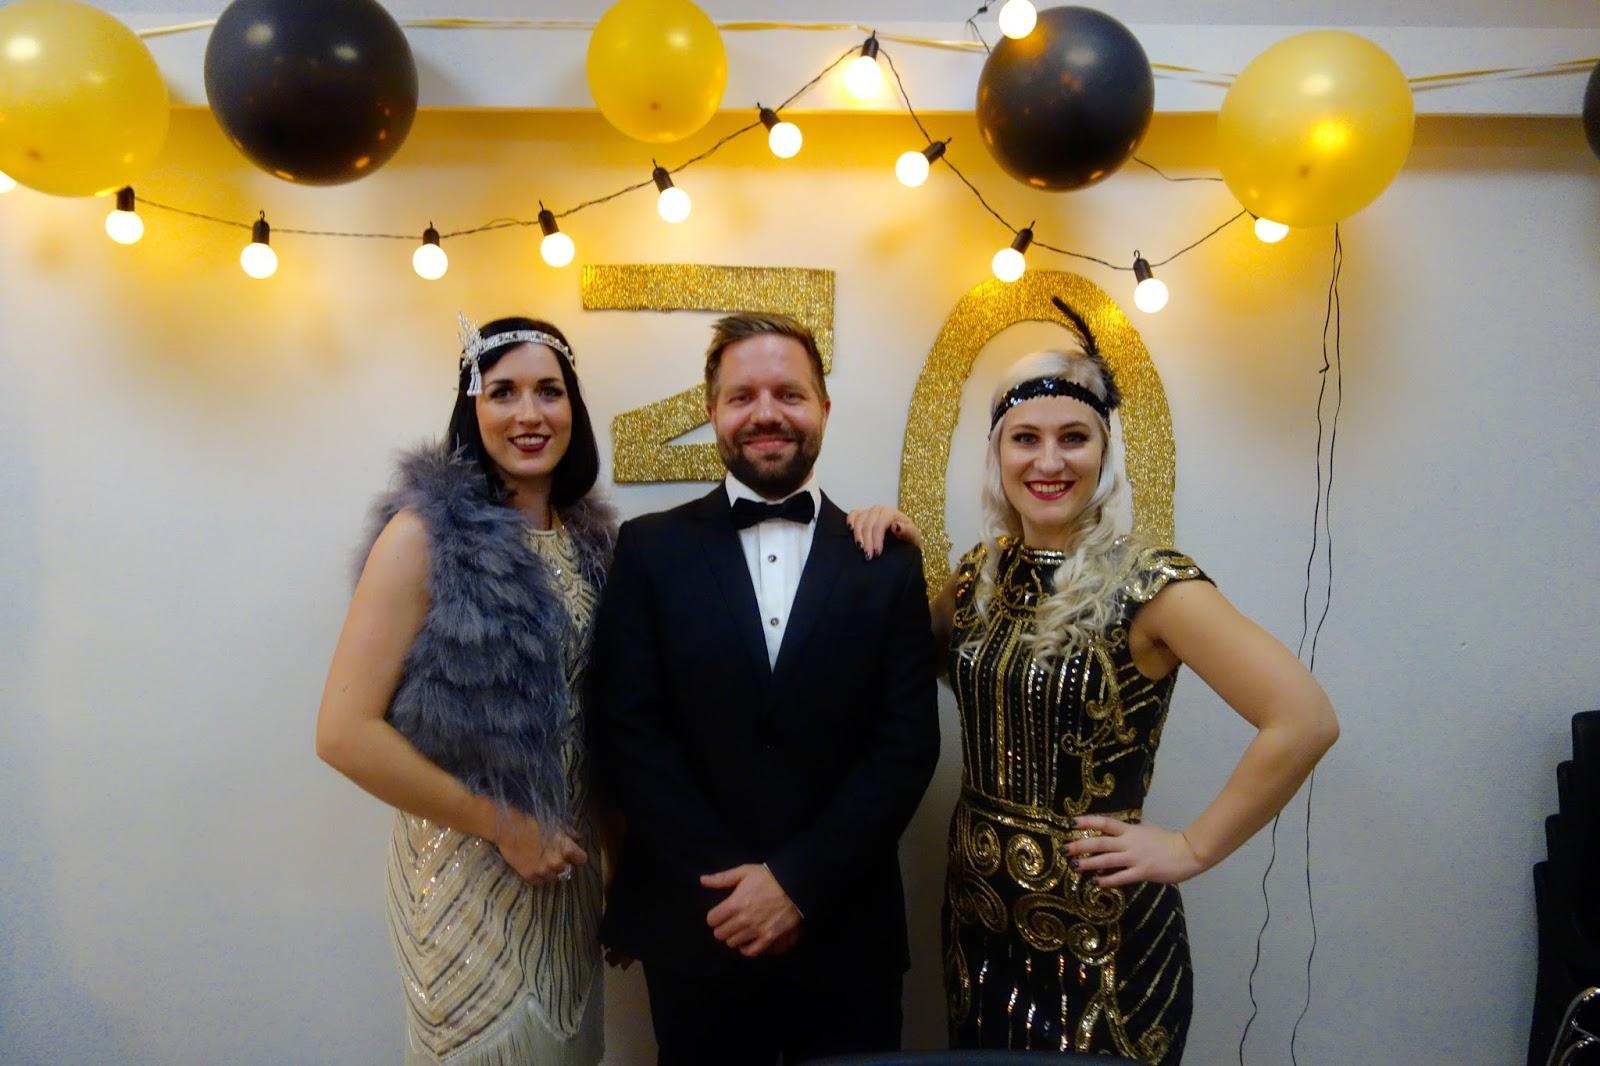 52d4d695958f I går feira eg, søskenbarnet mitt Marius og kjærasten hans/venninna mi Anne  Mari 30-årsdagane våre på forskot. Tema var The Great Gatsby.